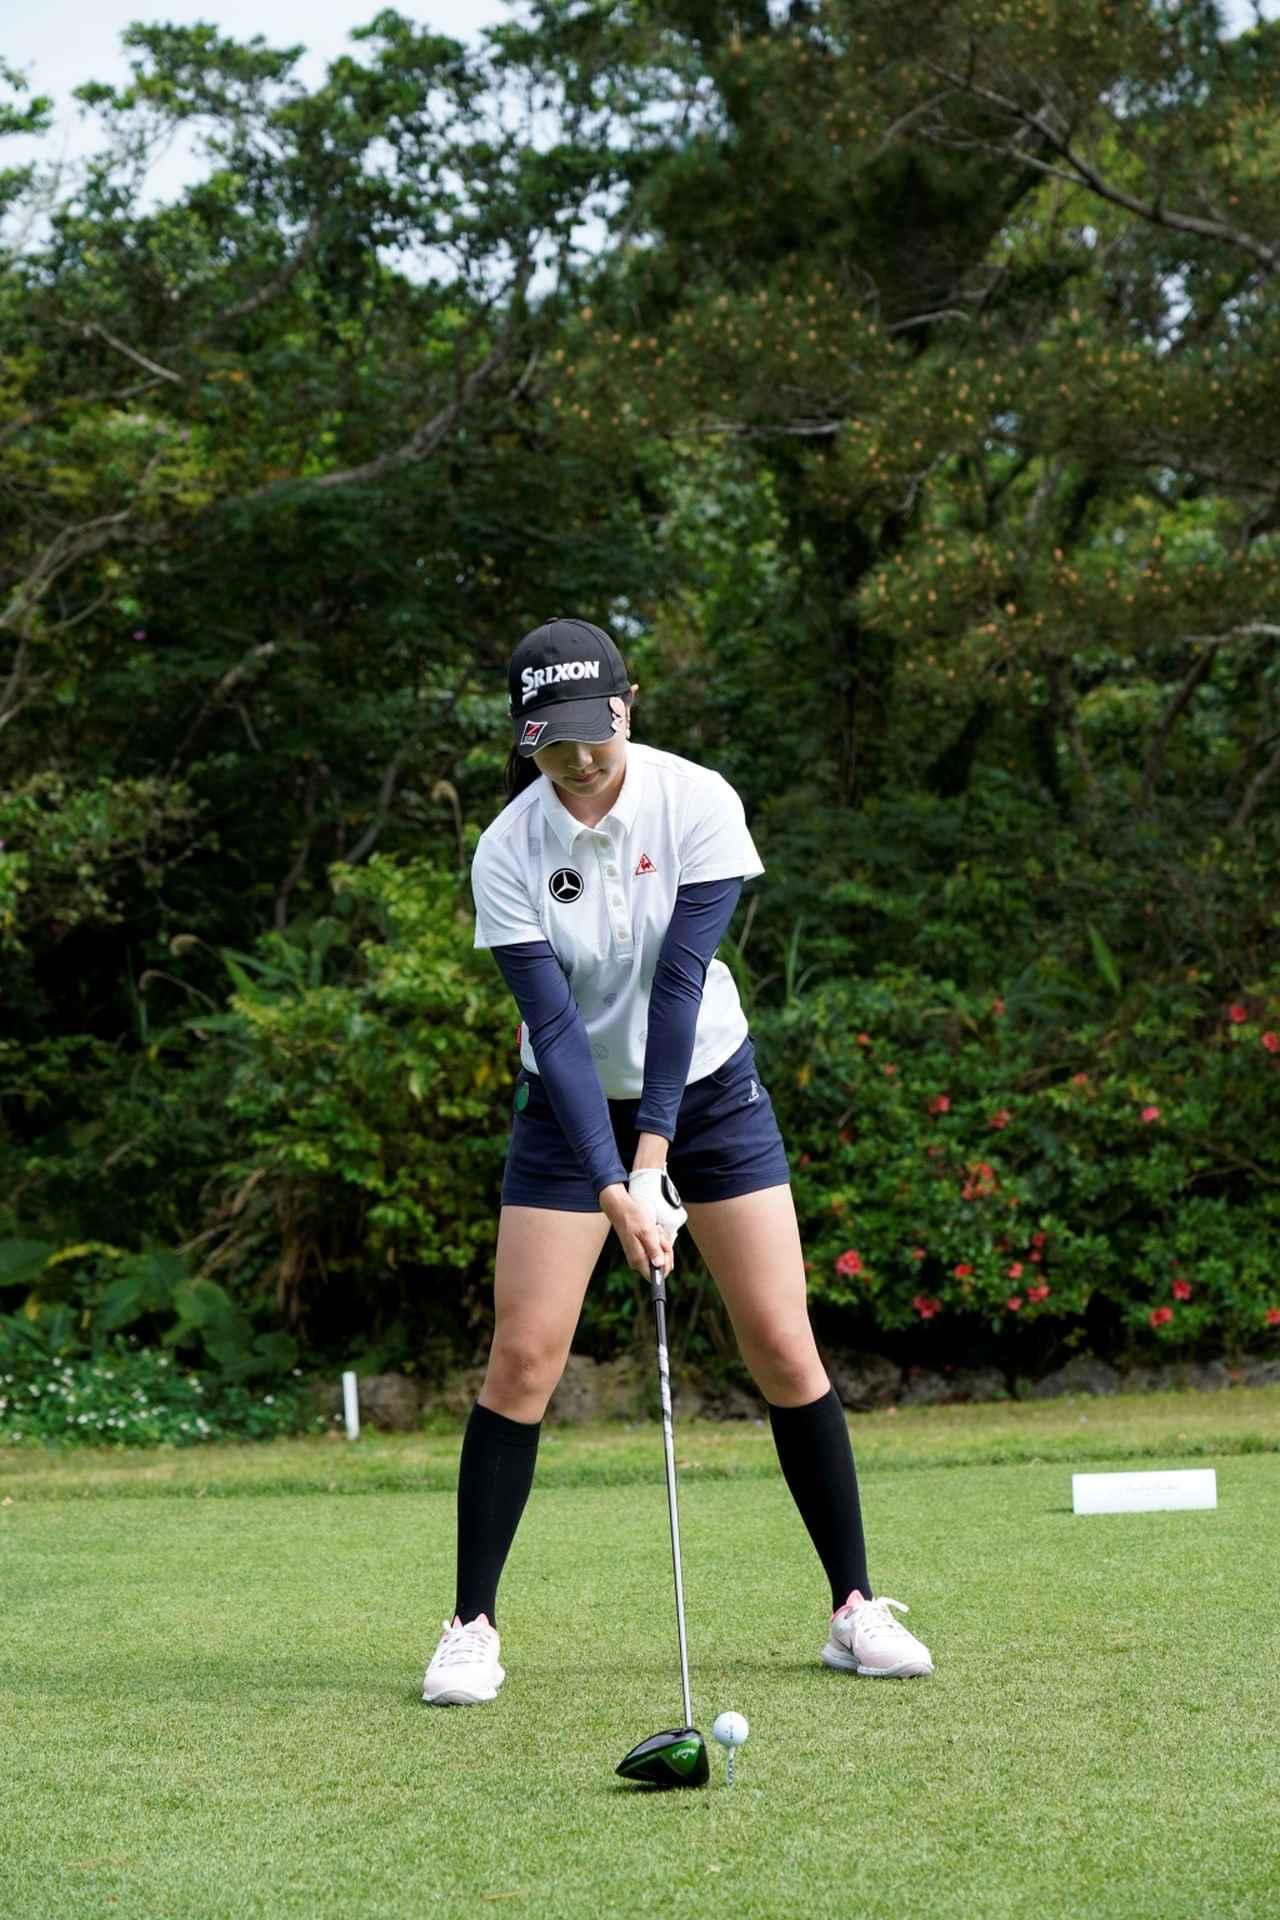 Images : 1番目の画像 - 三浦桃香のドライバー連続写真 - みんなのゴルフダイジェスト